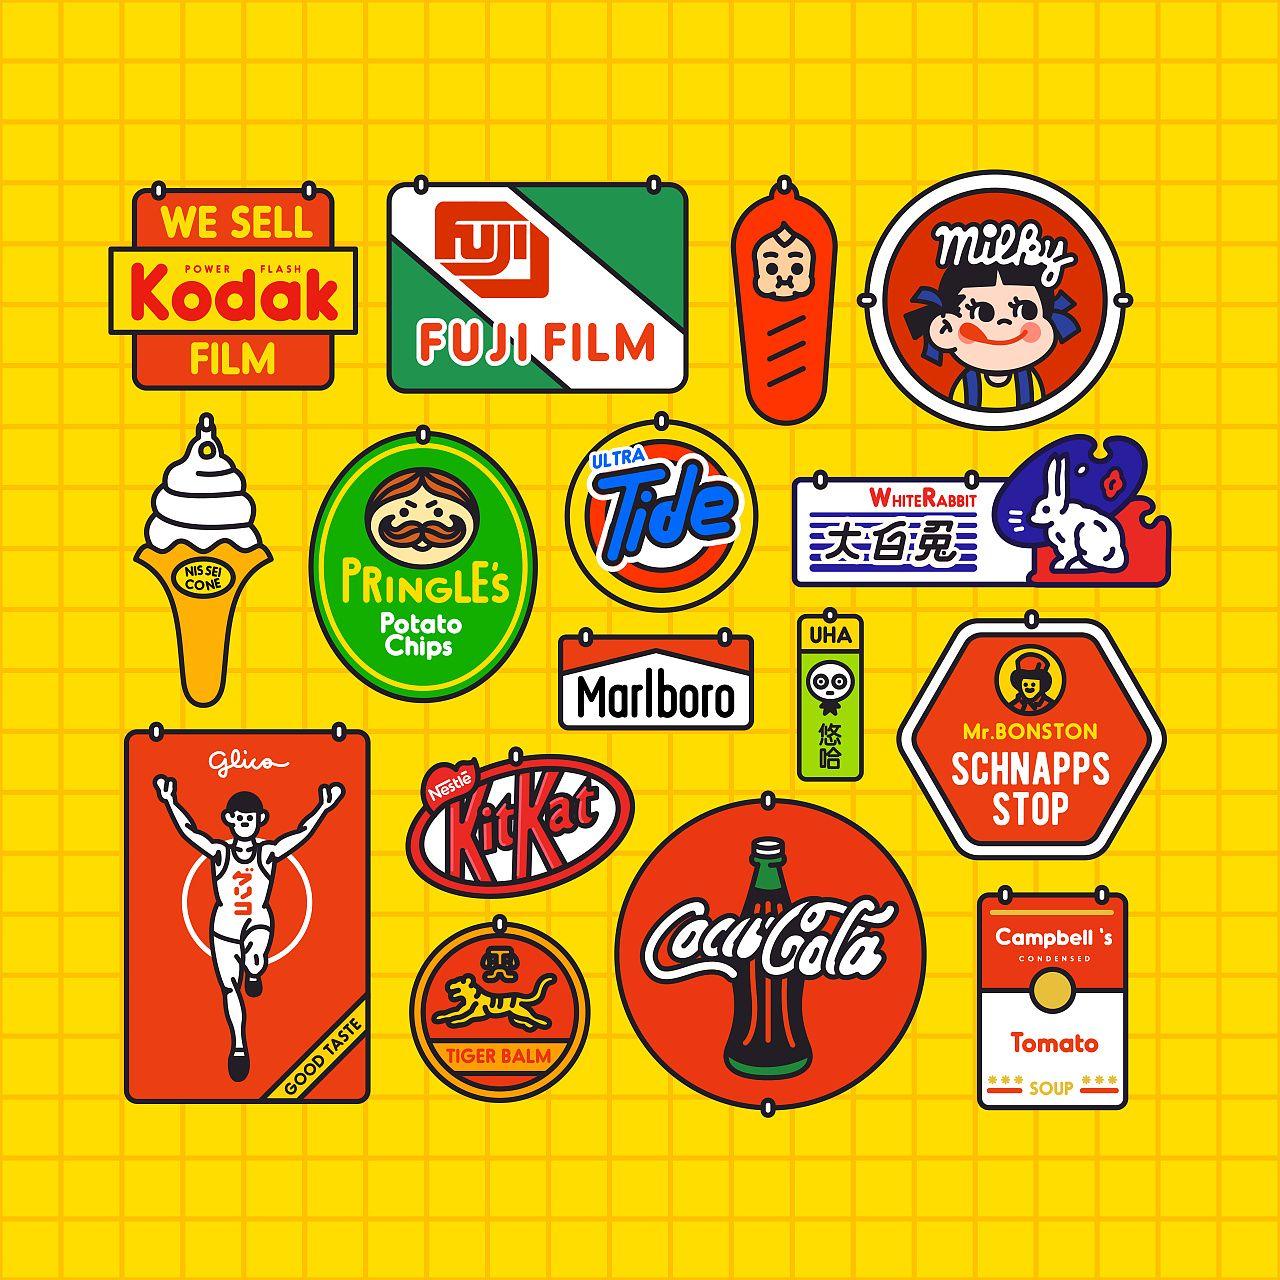 Line絵文字 Emoji 画像あり Line 絵文字 絵文字 イラスト